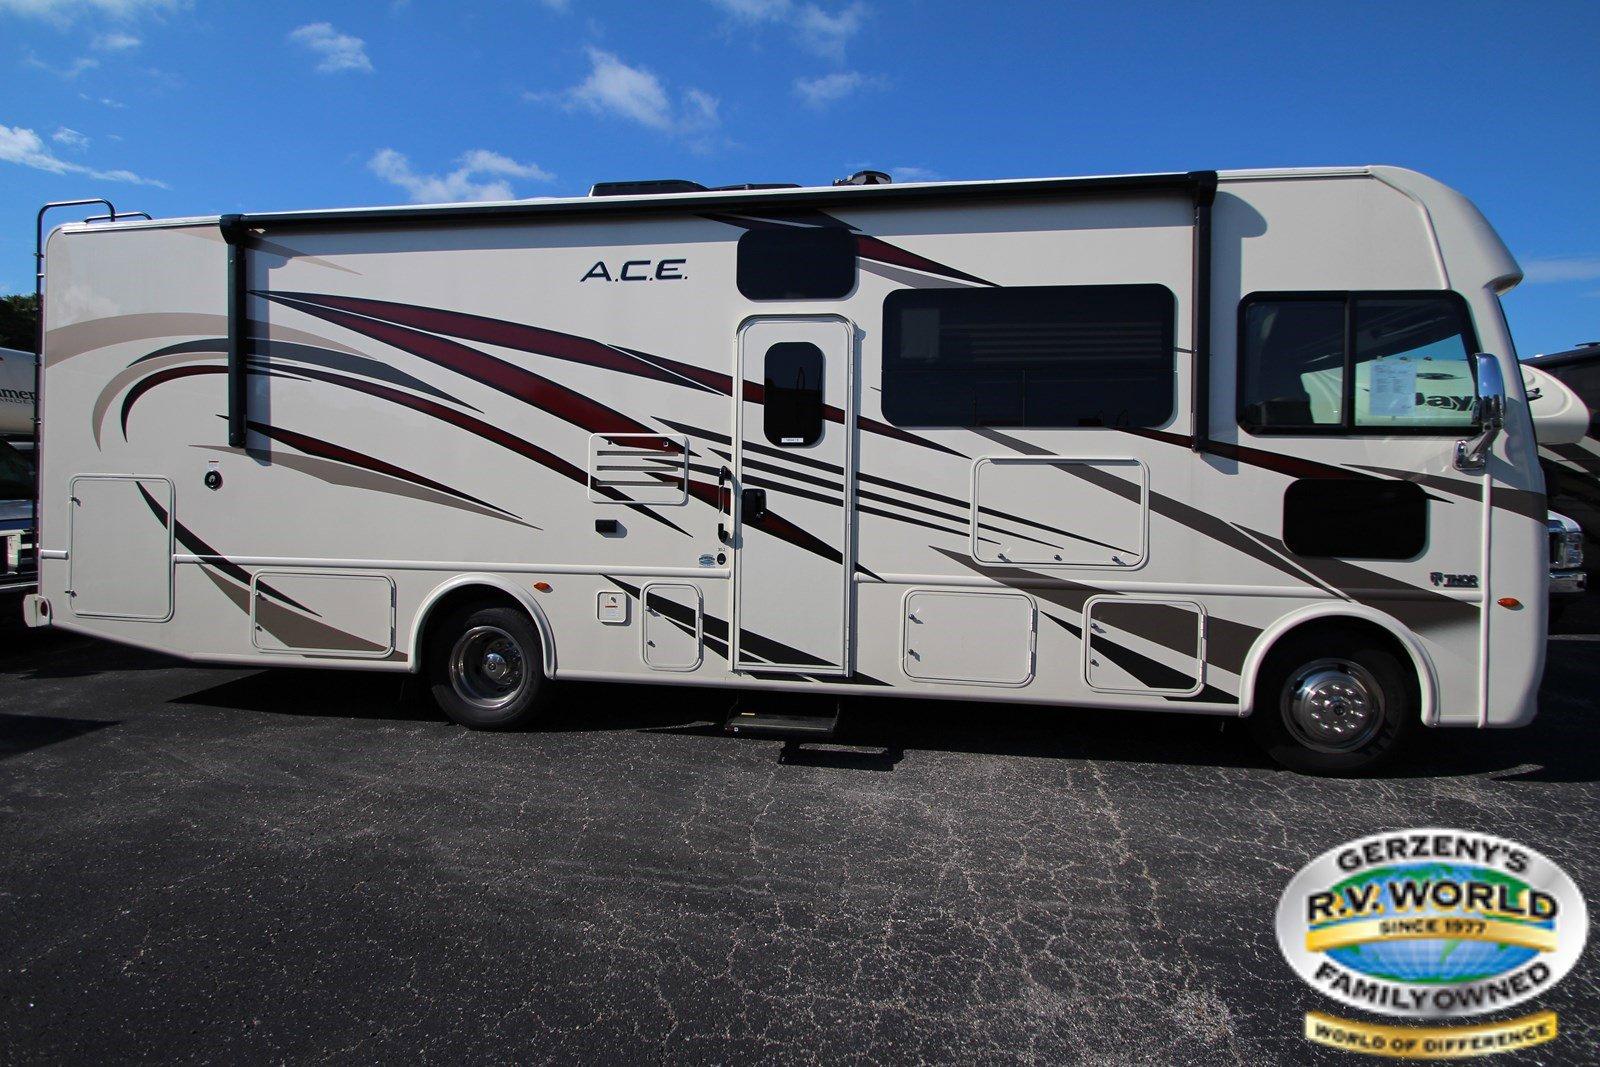 2019 Thor Motor Coach Ace 30.2 Thumbnail